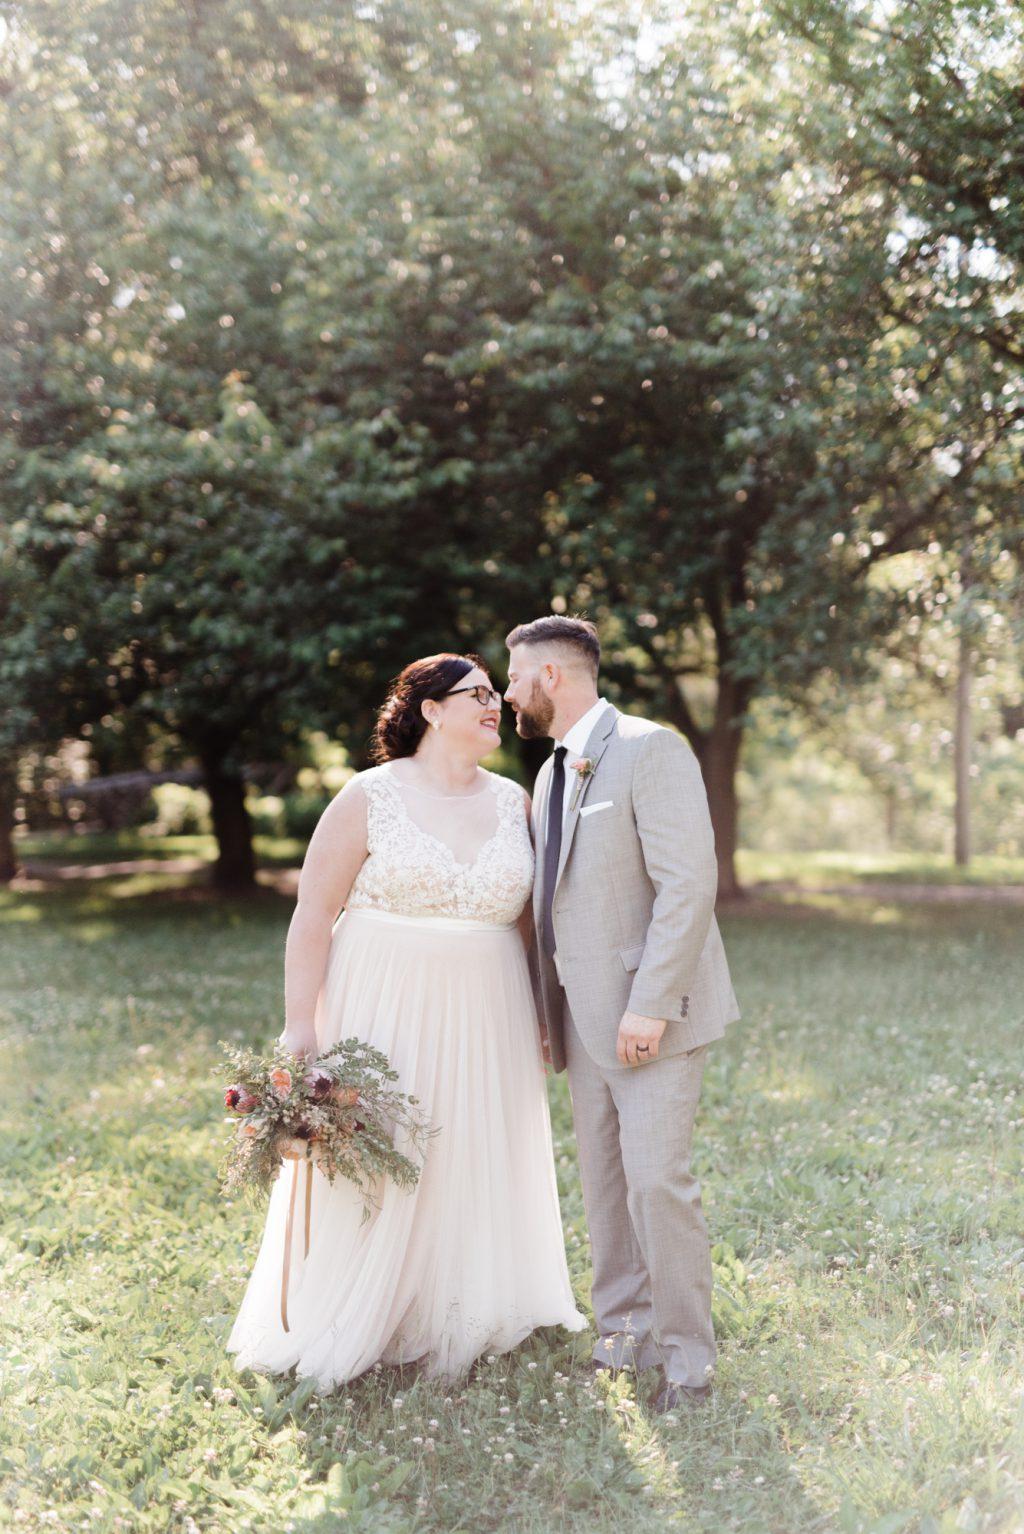 haley-richter-photo-west-chester-summer-wedding-boxcar-brewery-154